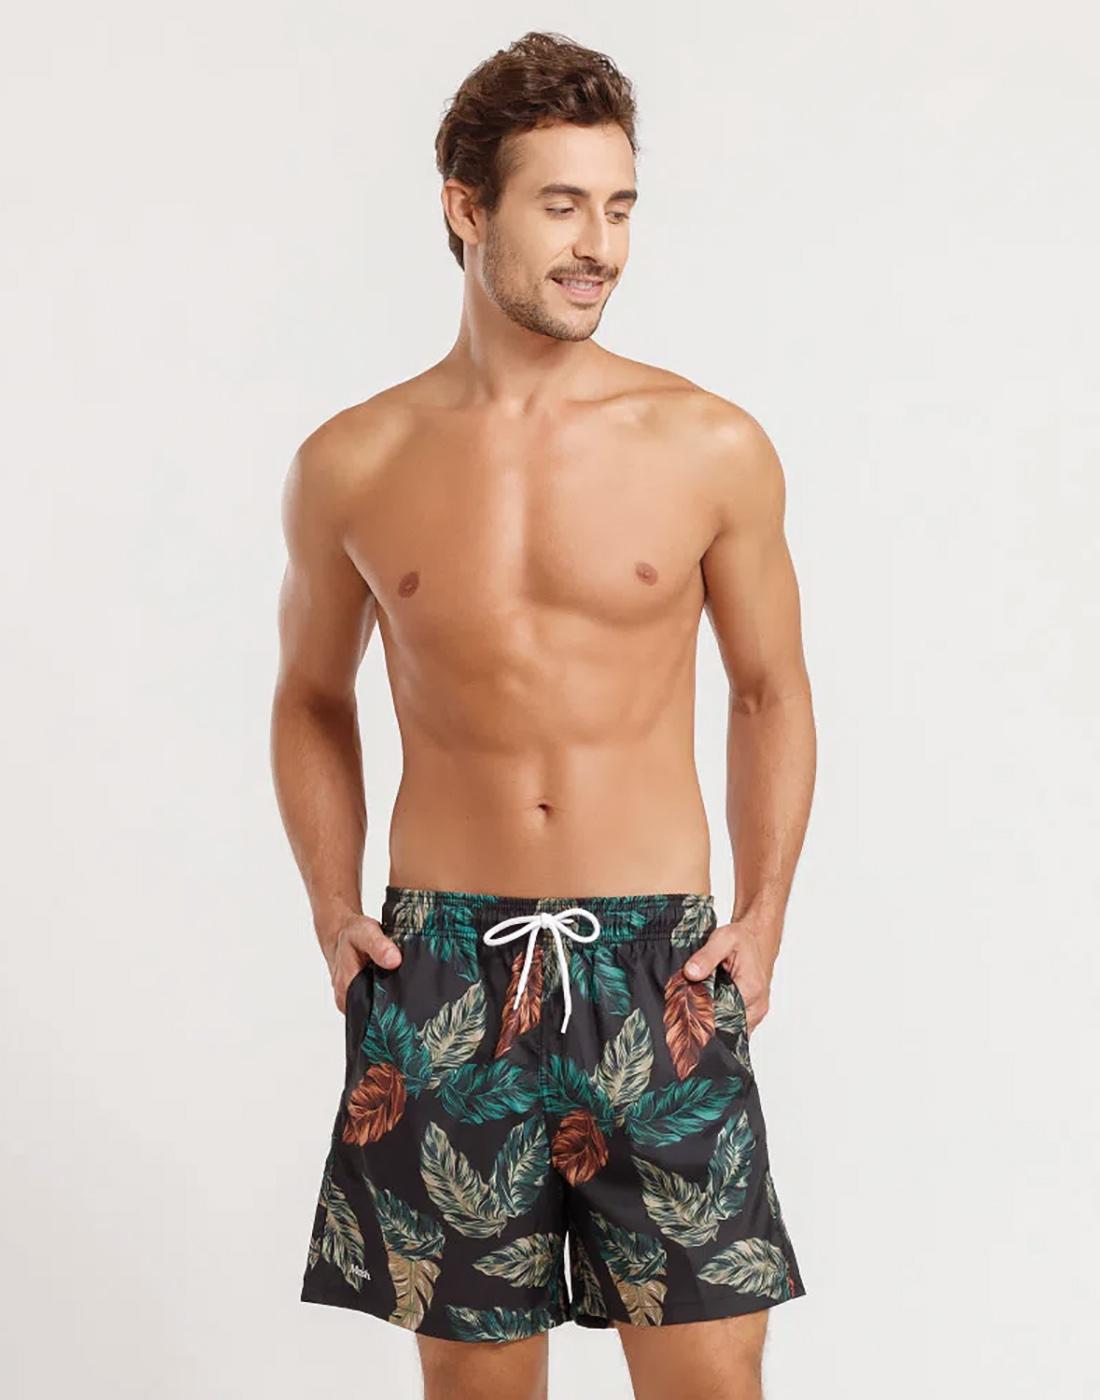 Shorts Classico Folhagem Tropical FPS 30 Masculino Mash